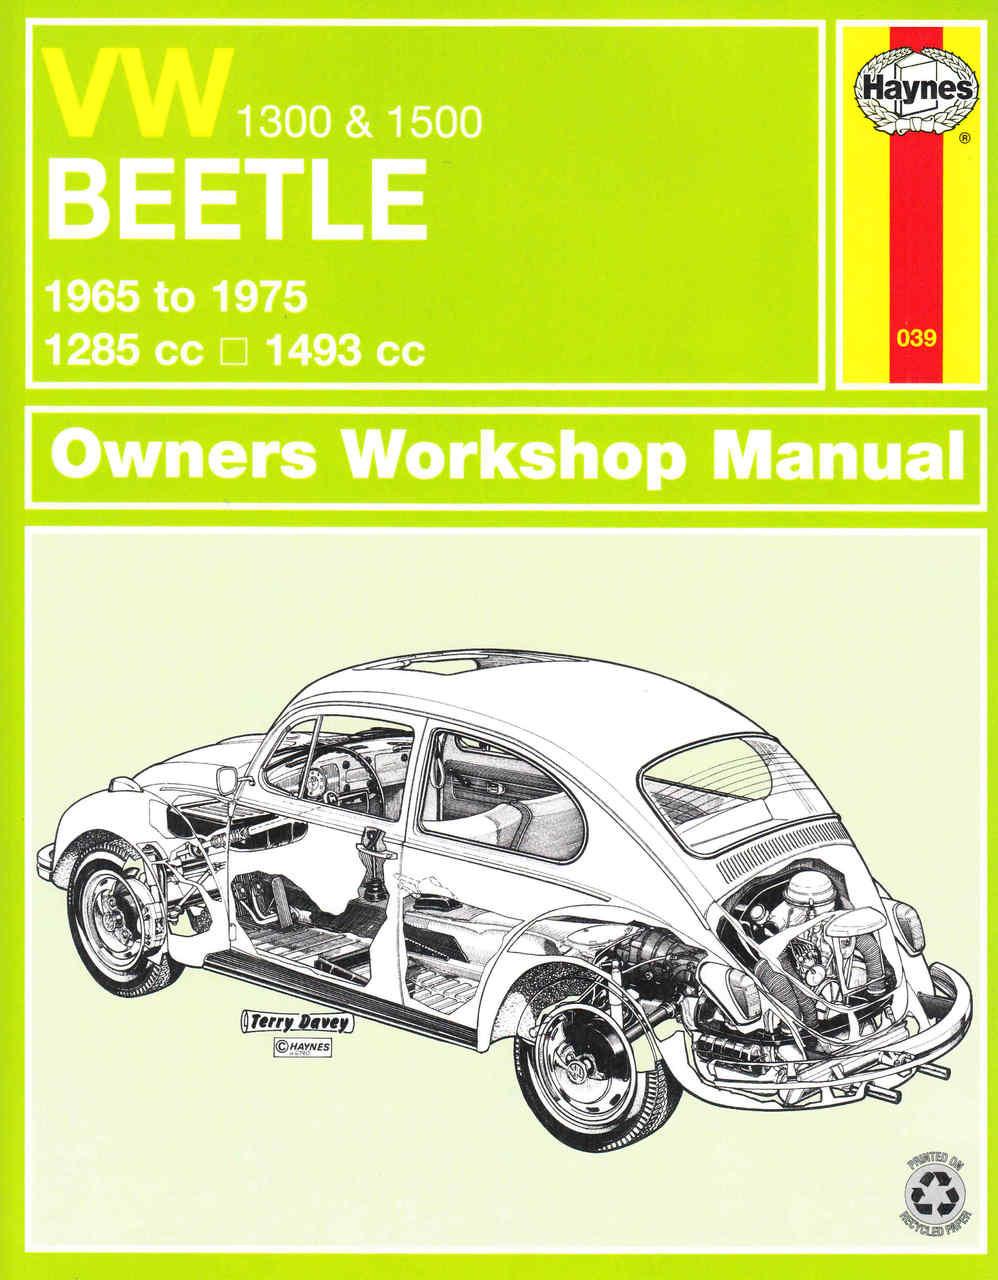 vw beetle 1300 1500 1965 to 1975 owners workshop manual rh automotobookshop com au vw beetle manual transmission swap vw beetle manual transmission problems